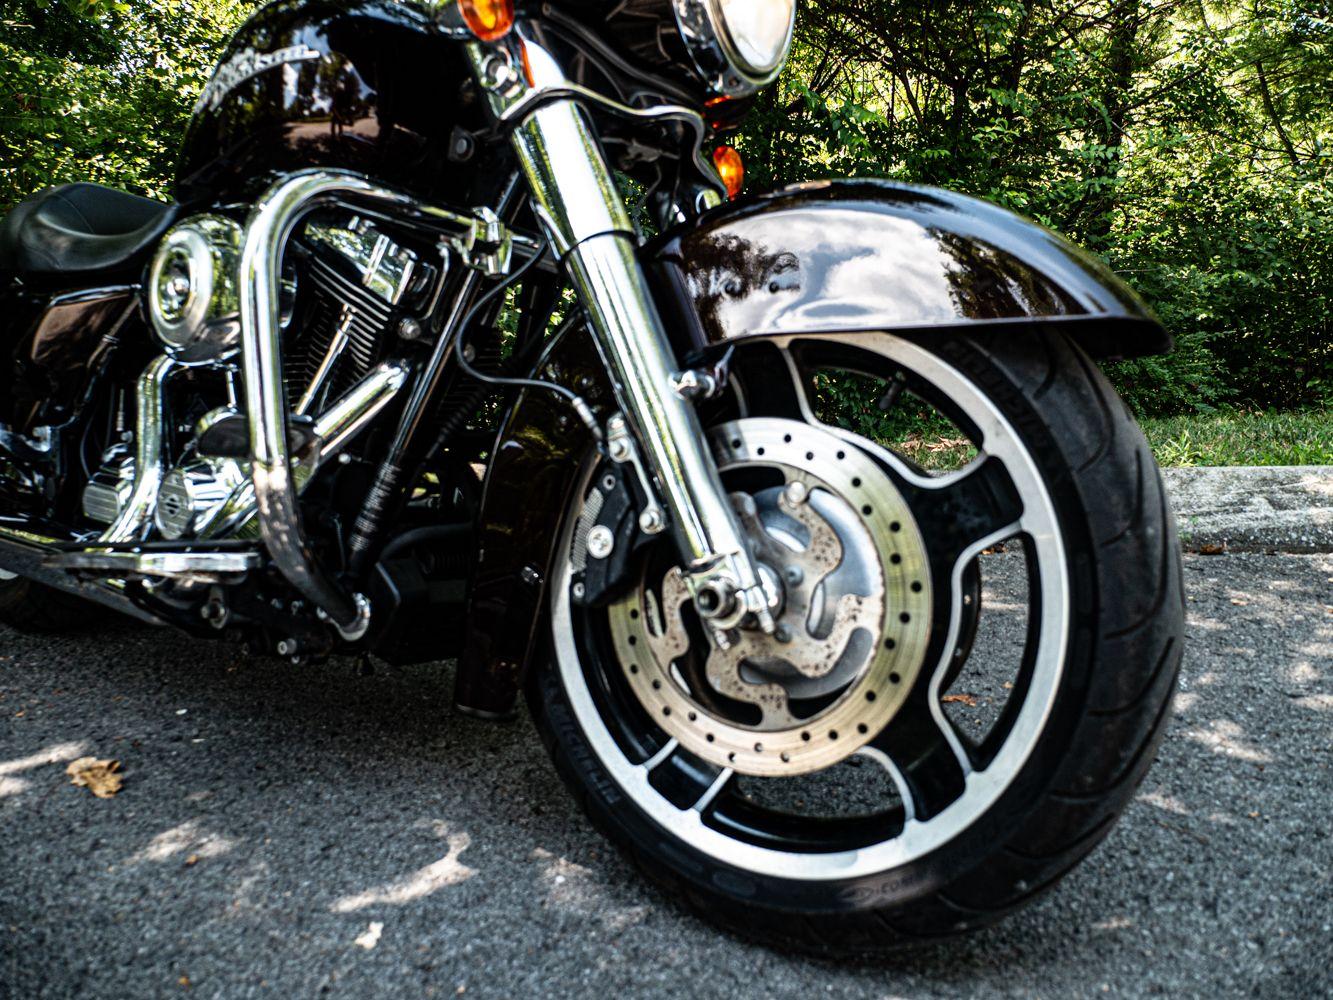 Pre-Owned 2011 Harley-Davidson Street Glide